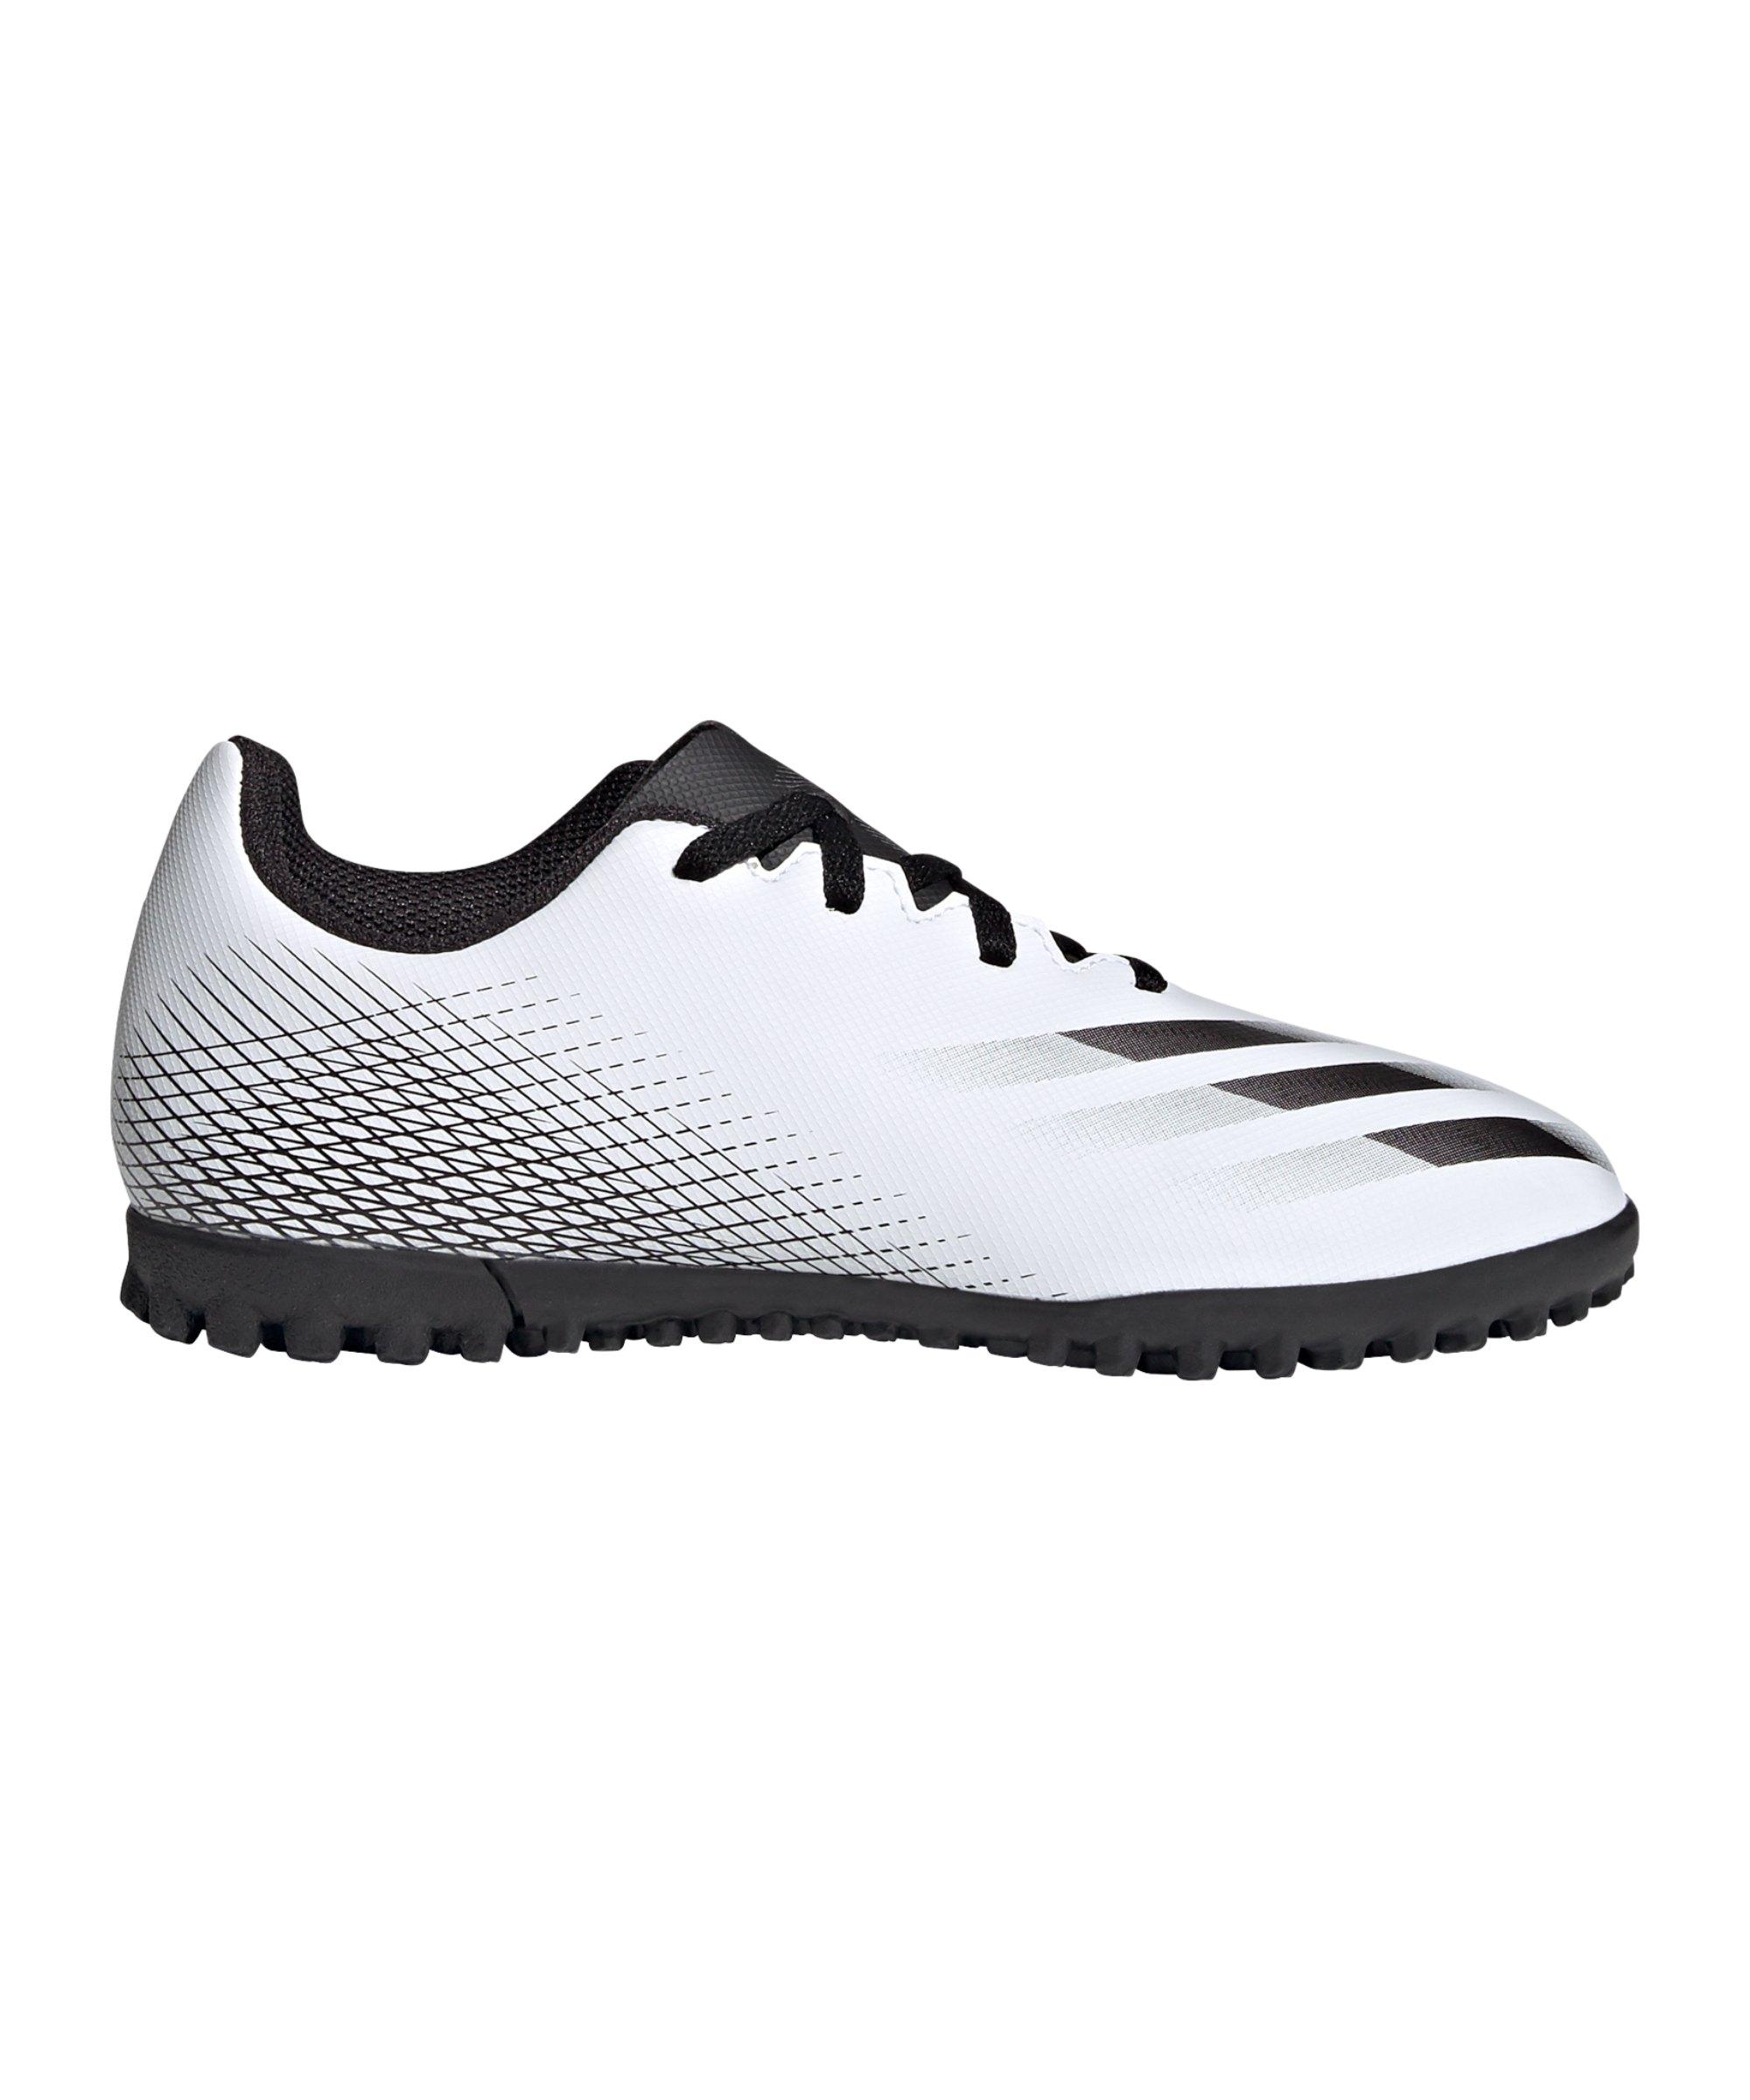 adidas X GHOSTED.4 TF Inflight J Kids Weiss - weiss